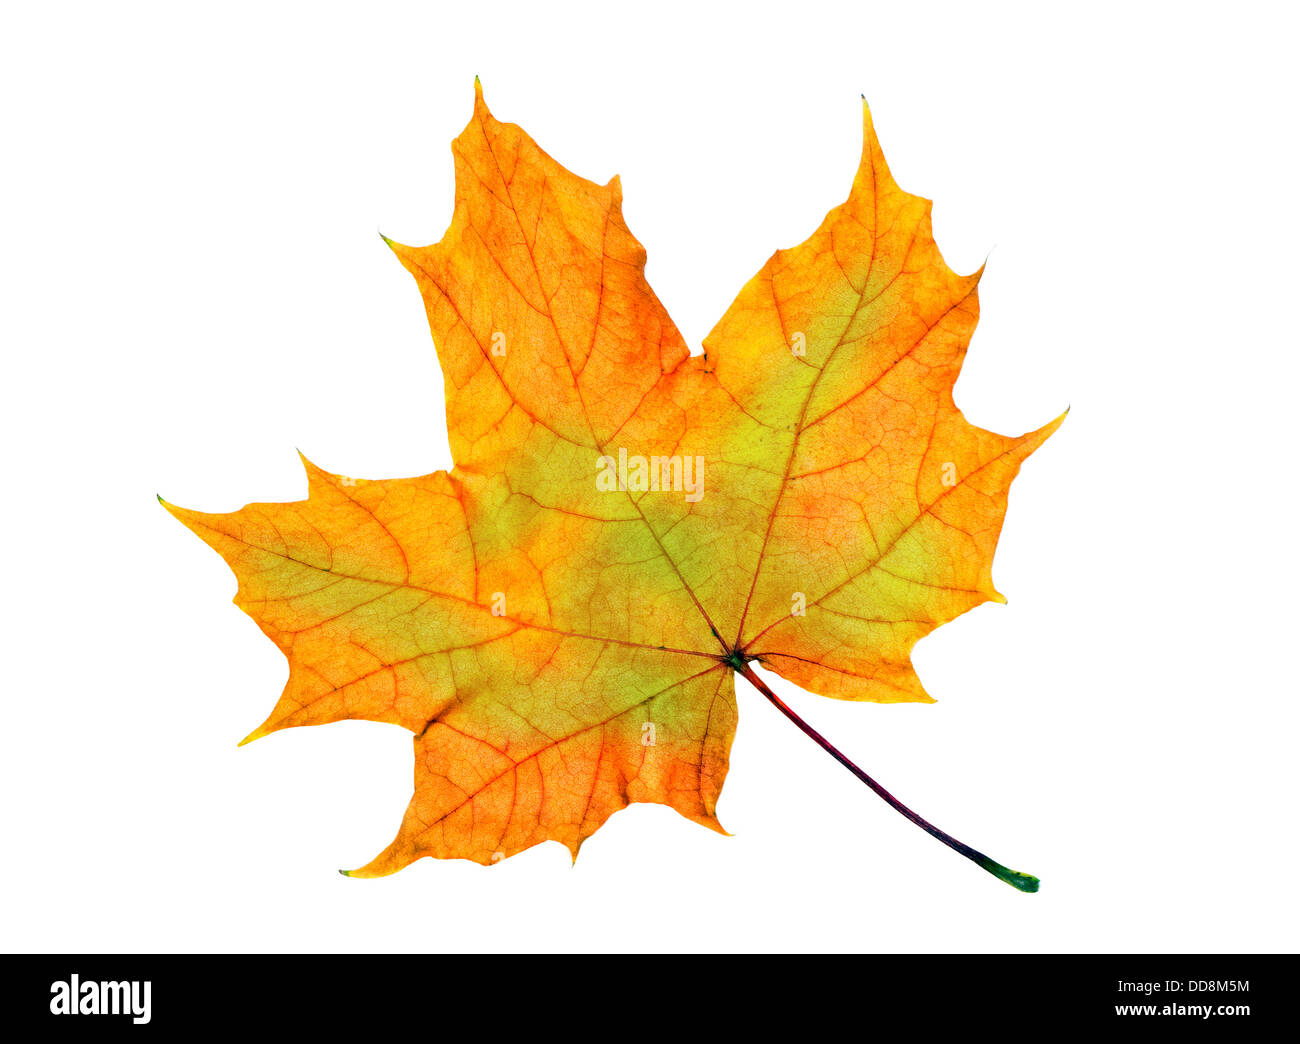 maple leaf isolated over white - Stock Image